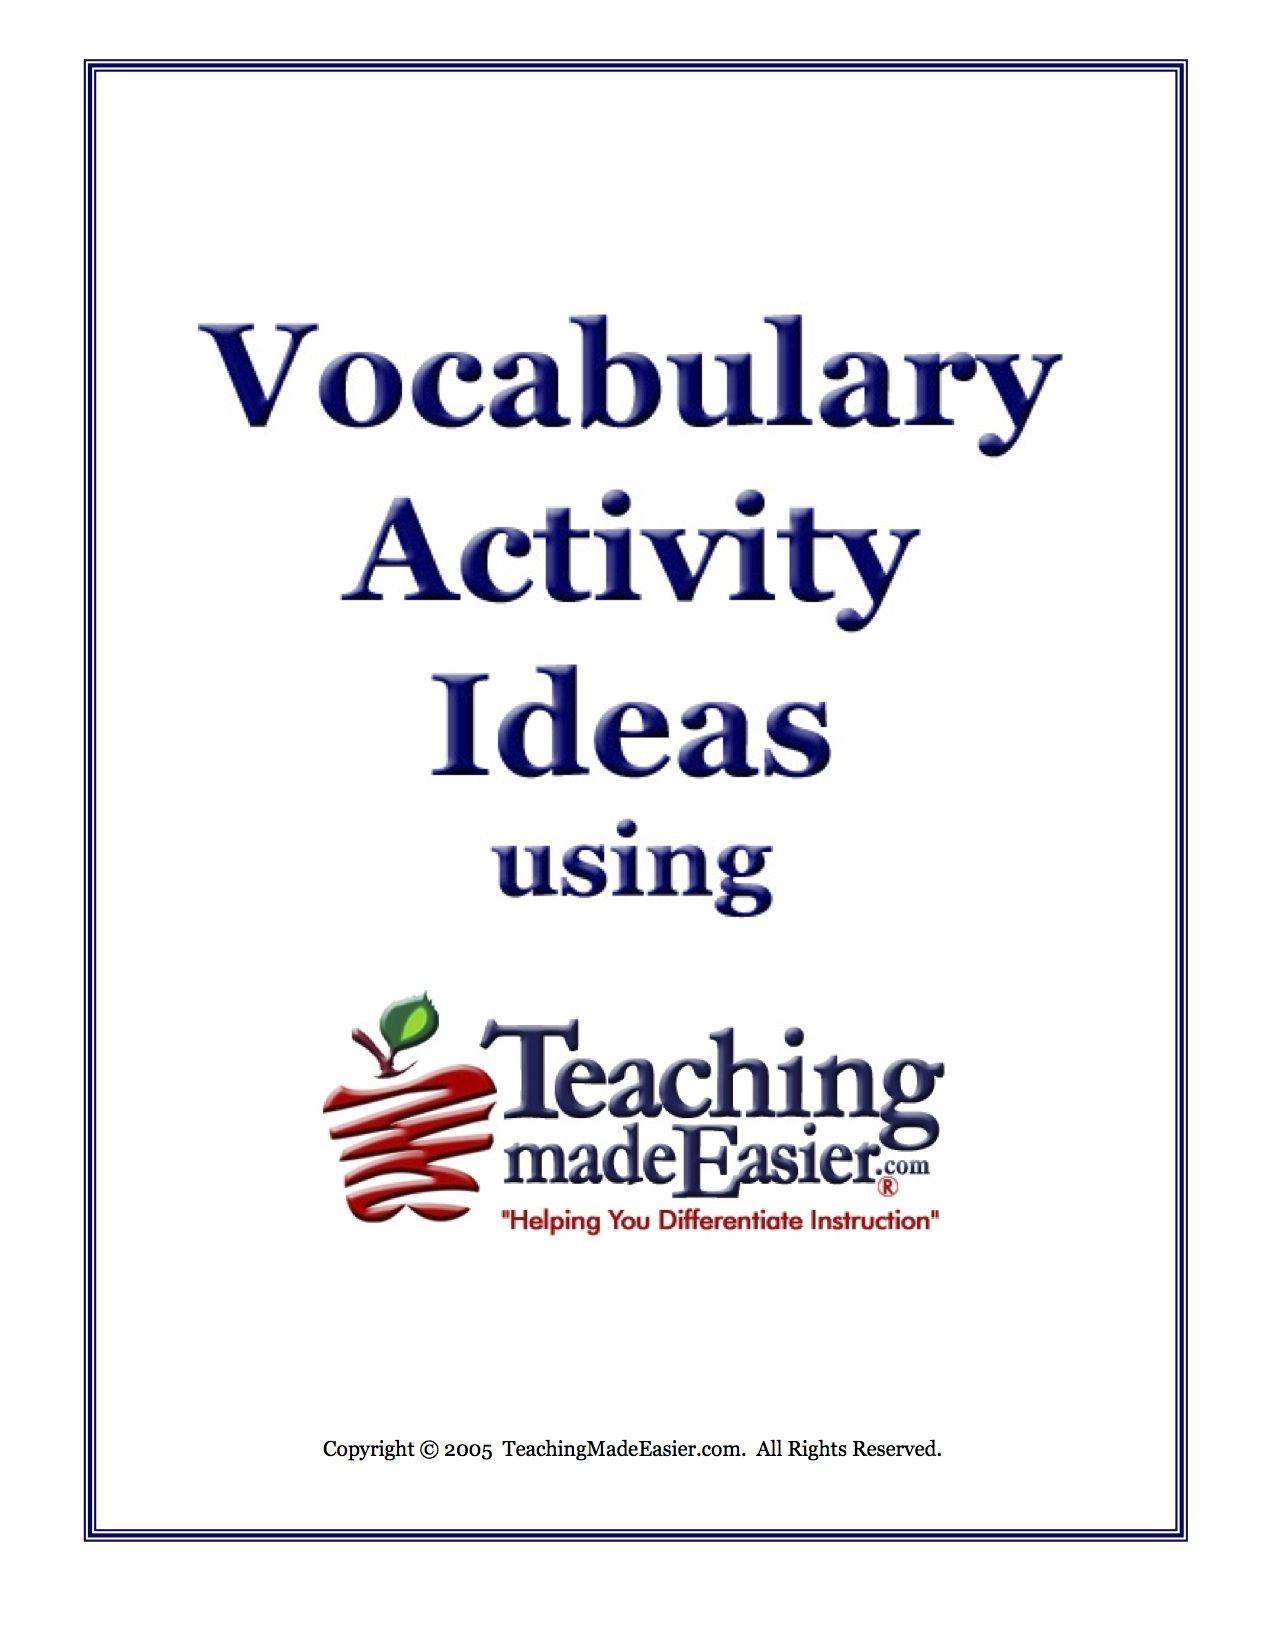 Pin By Teachingmadeeasier On Teaching Made Easier